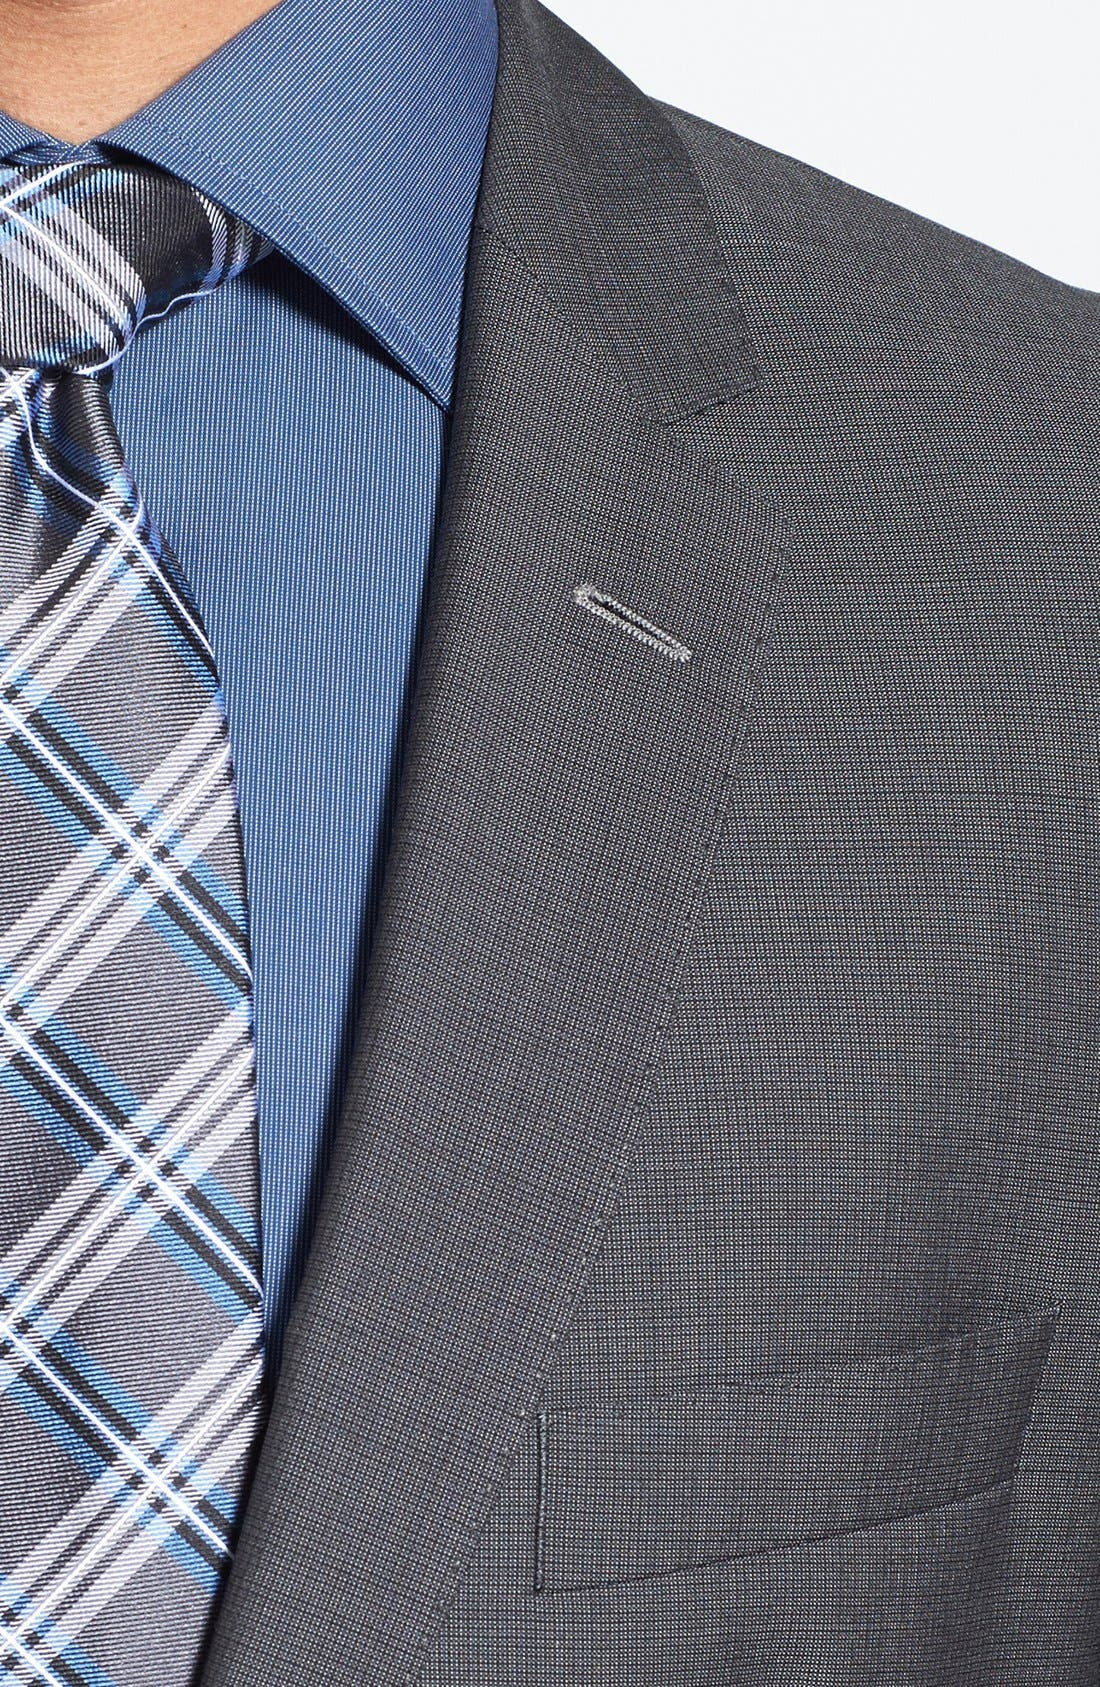 Alternate Image 5  - BOSS HUGO BOSS 'Edison/Power' Classic Fit Wool Blend Suit